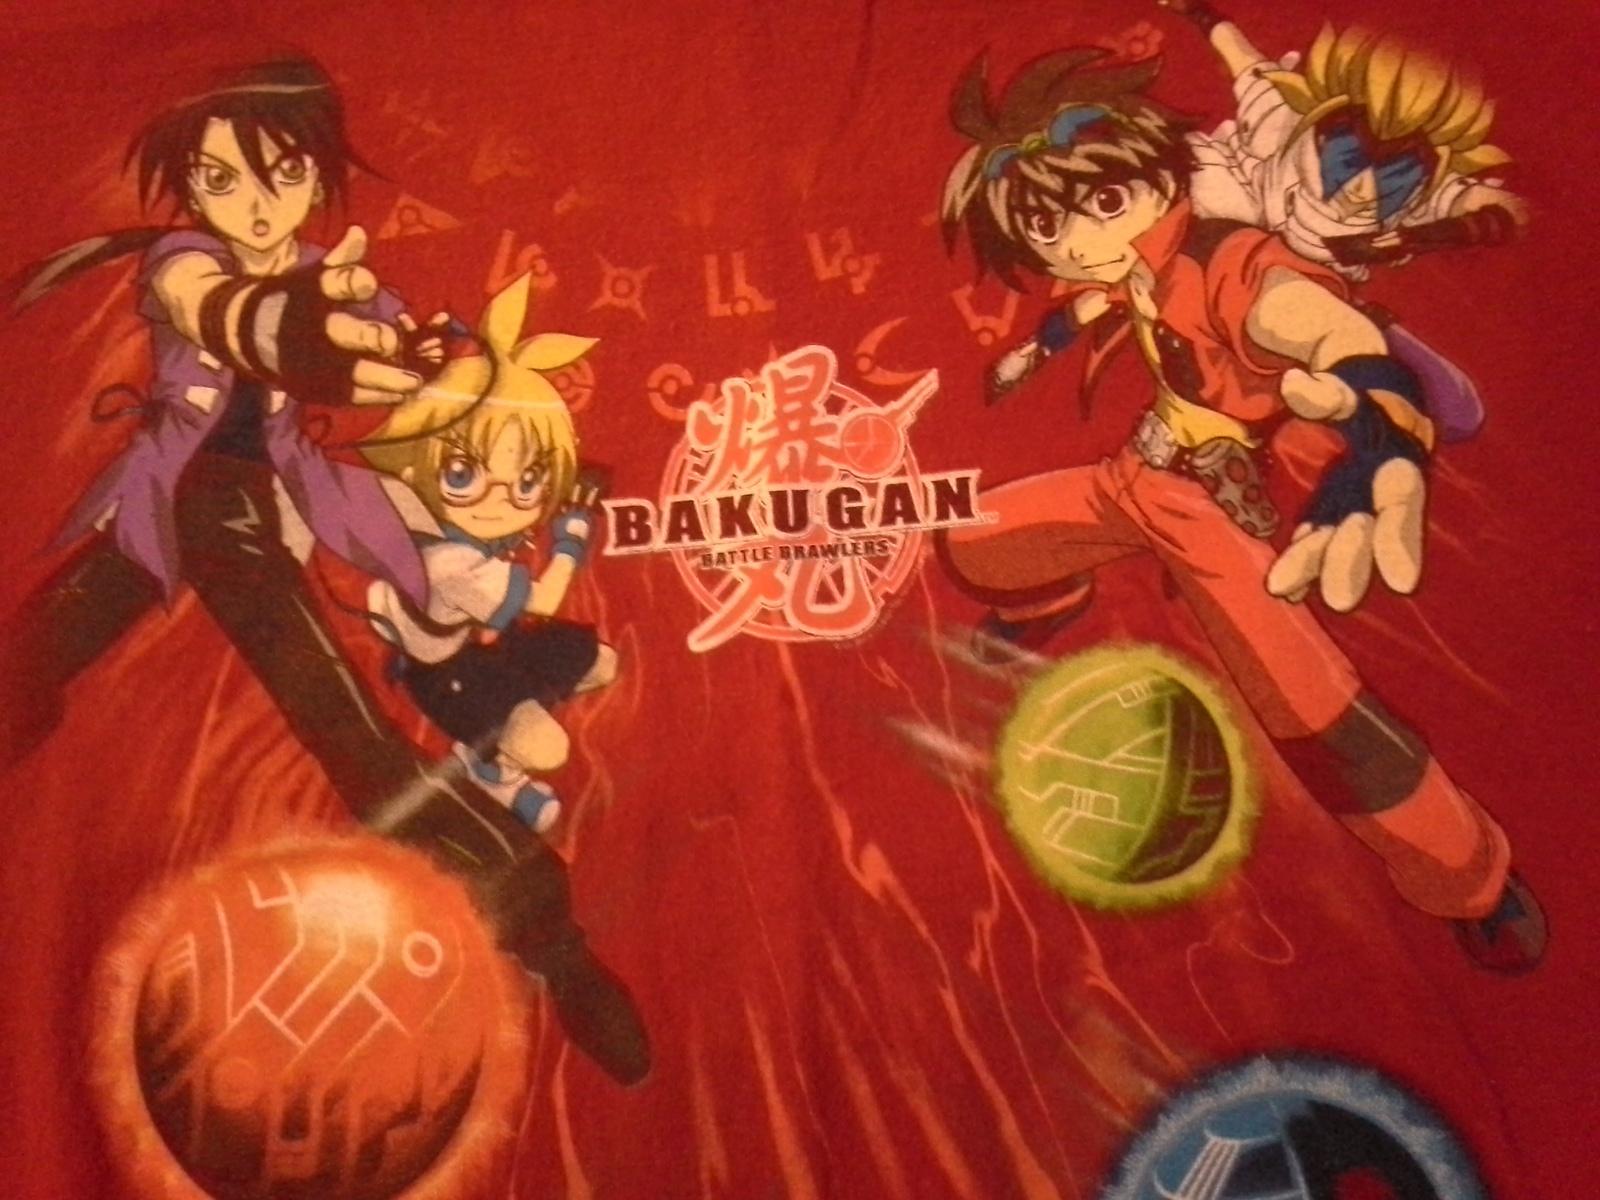 58f7265db Bakugan, Battle Brawlers, Japanese Animation, Boys Large T-Shirt - $8.95